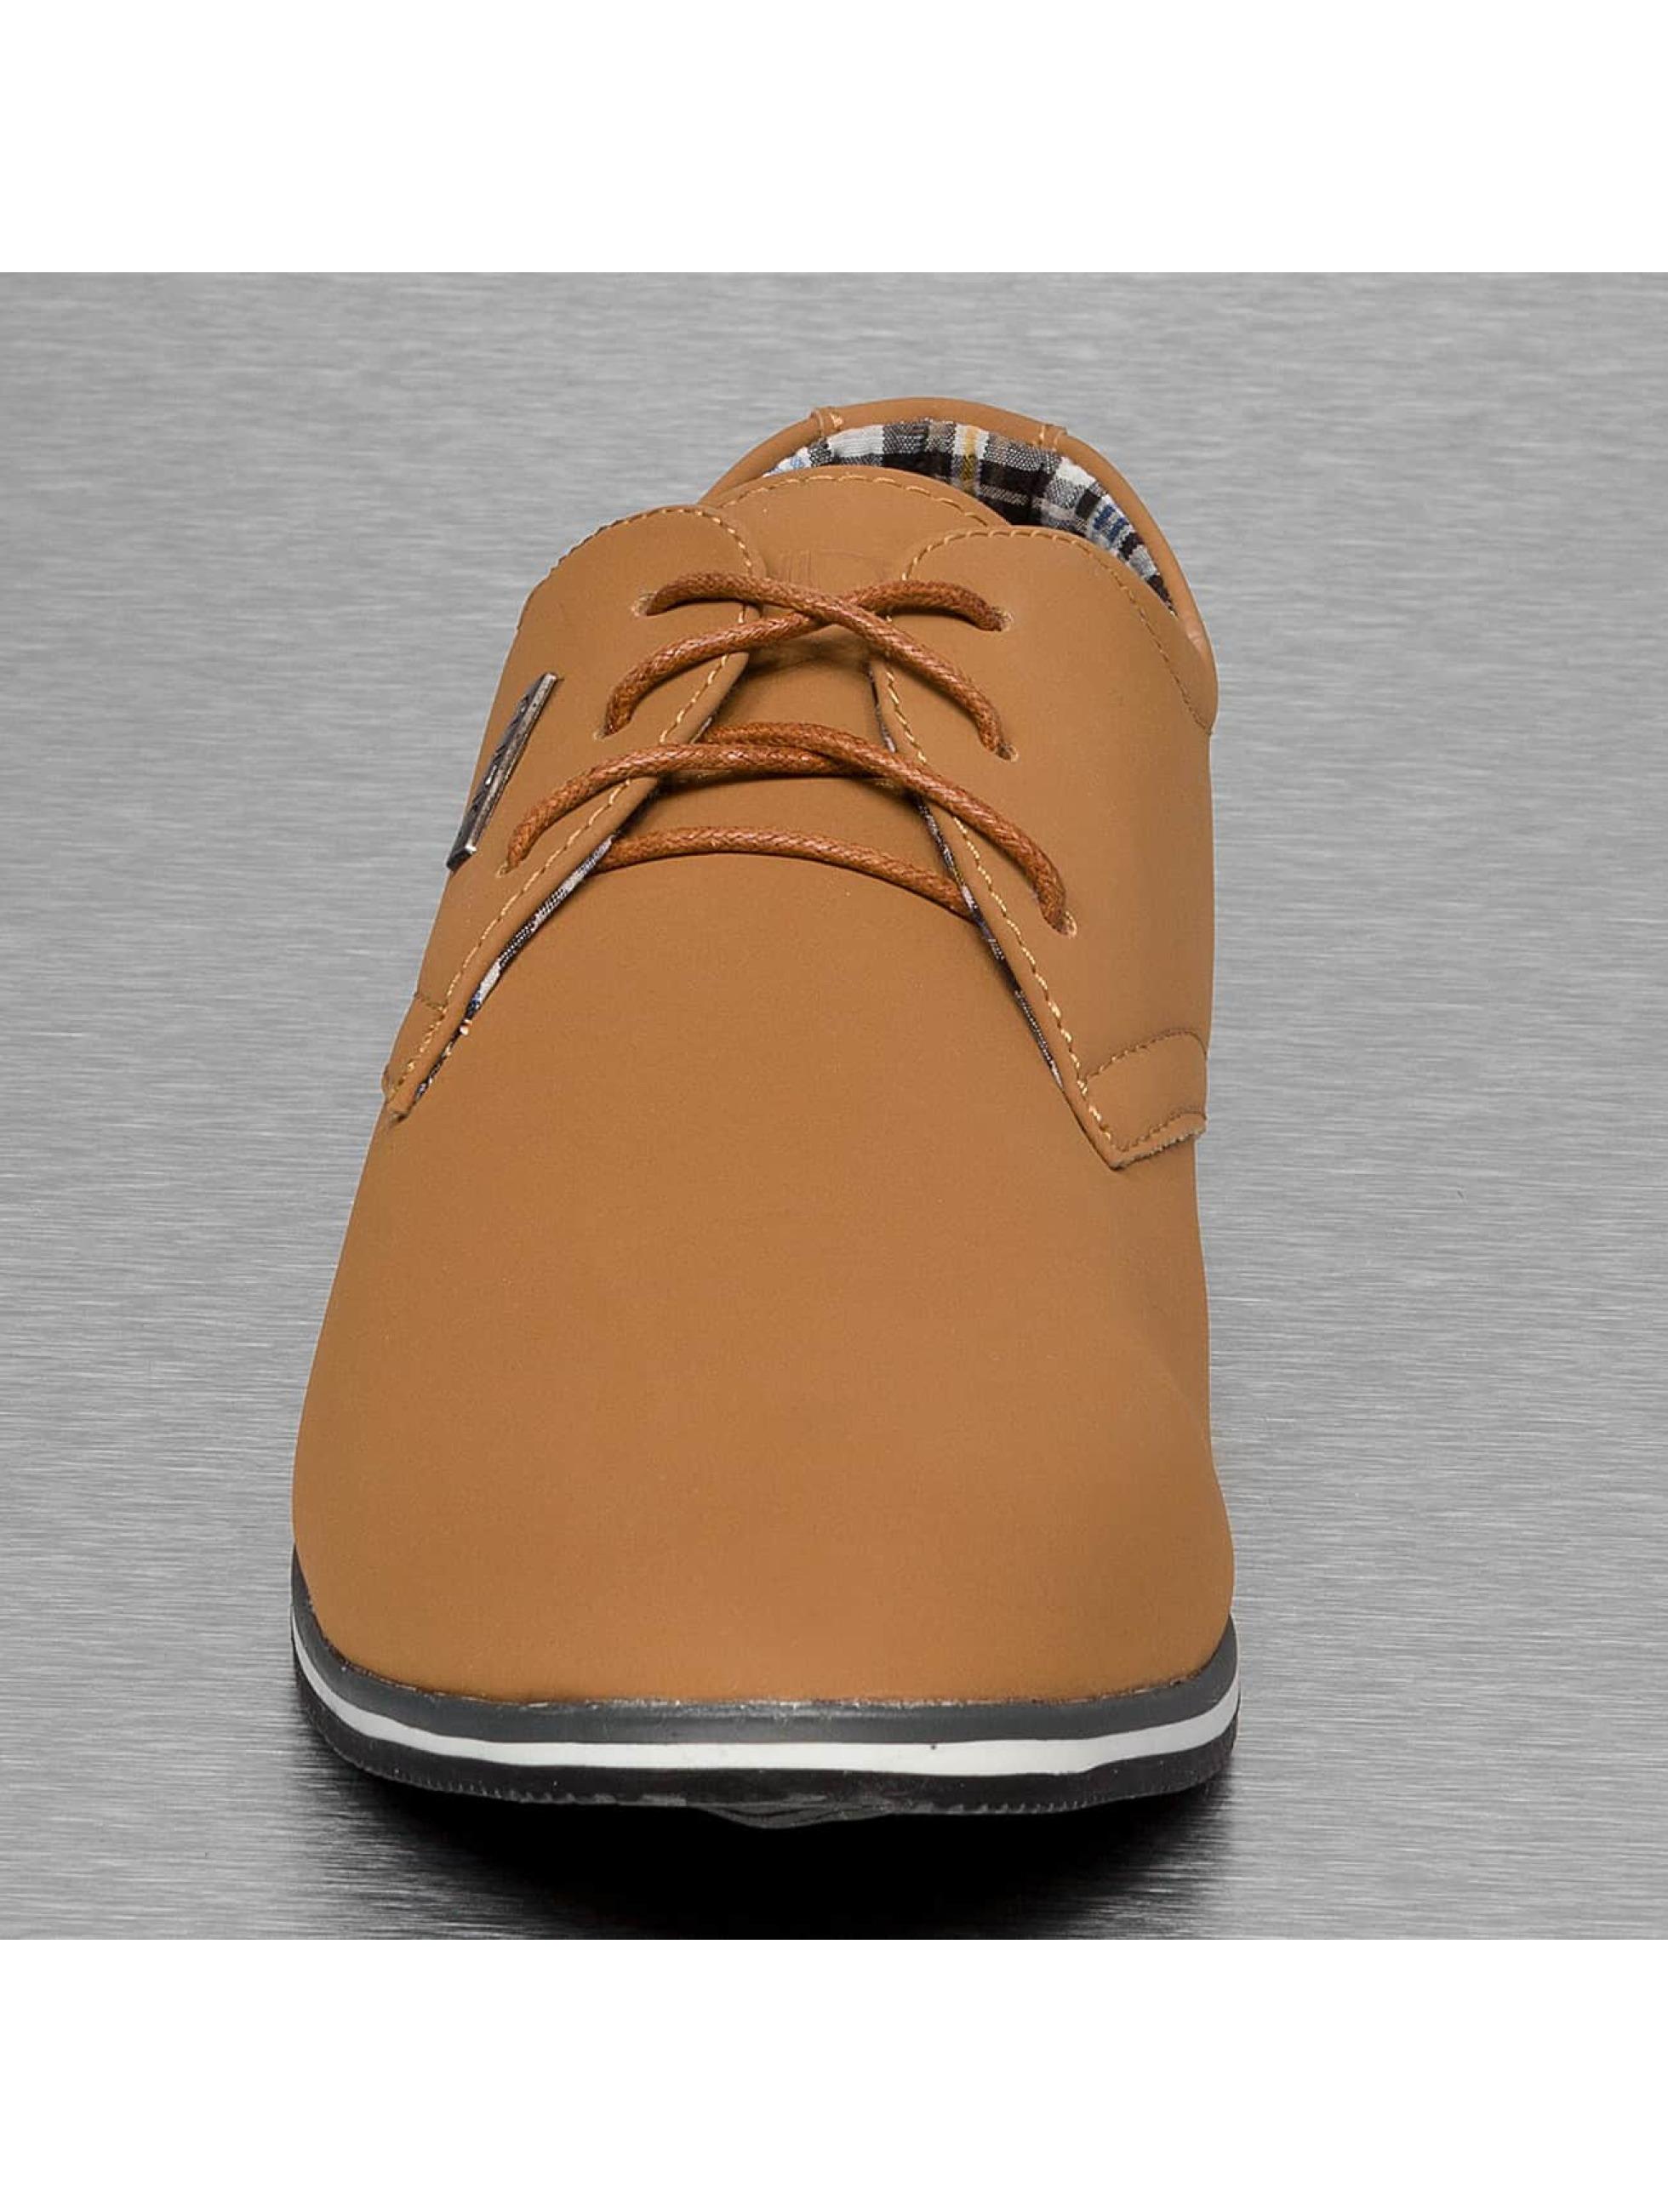 New York Style Сникеры Galway коричневый